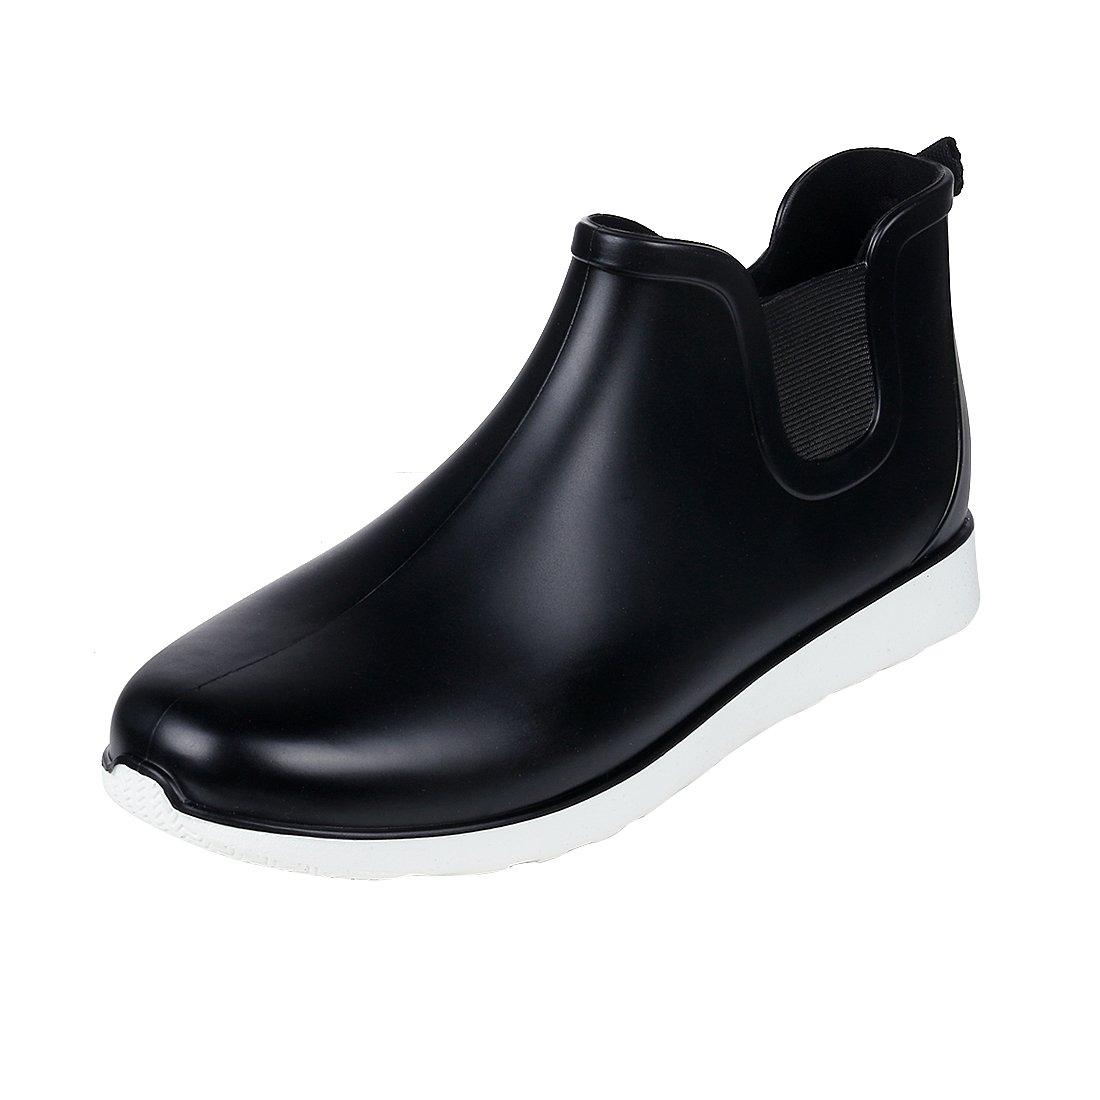 Comwarm Mens Waterproof Anti-Slip Rain Boots Casual Outdoor Sport Short Ankle Slip-on Rain Shoes BK44 Black by Comwarm